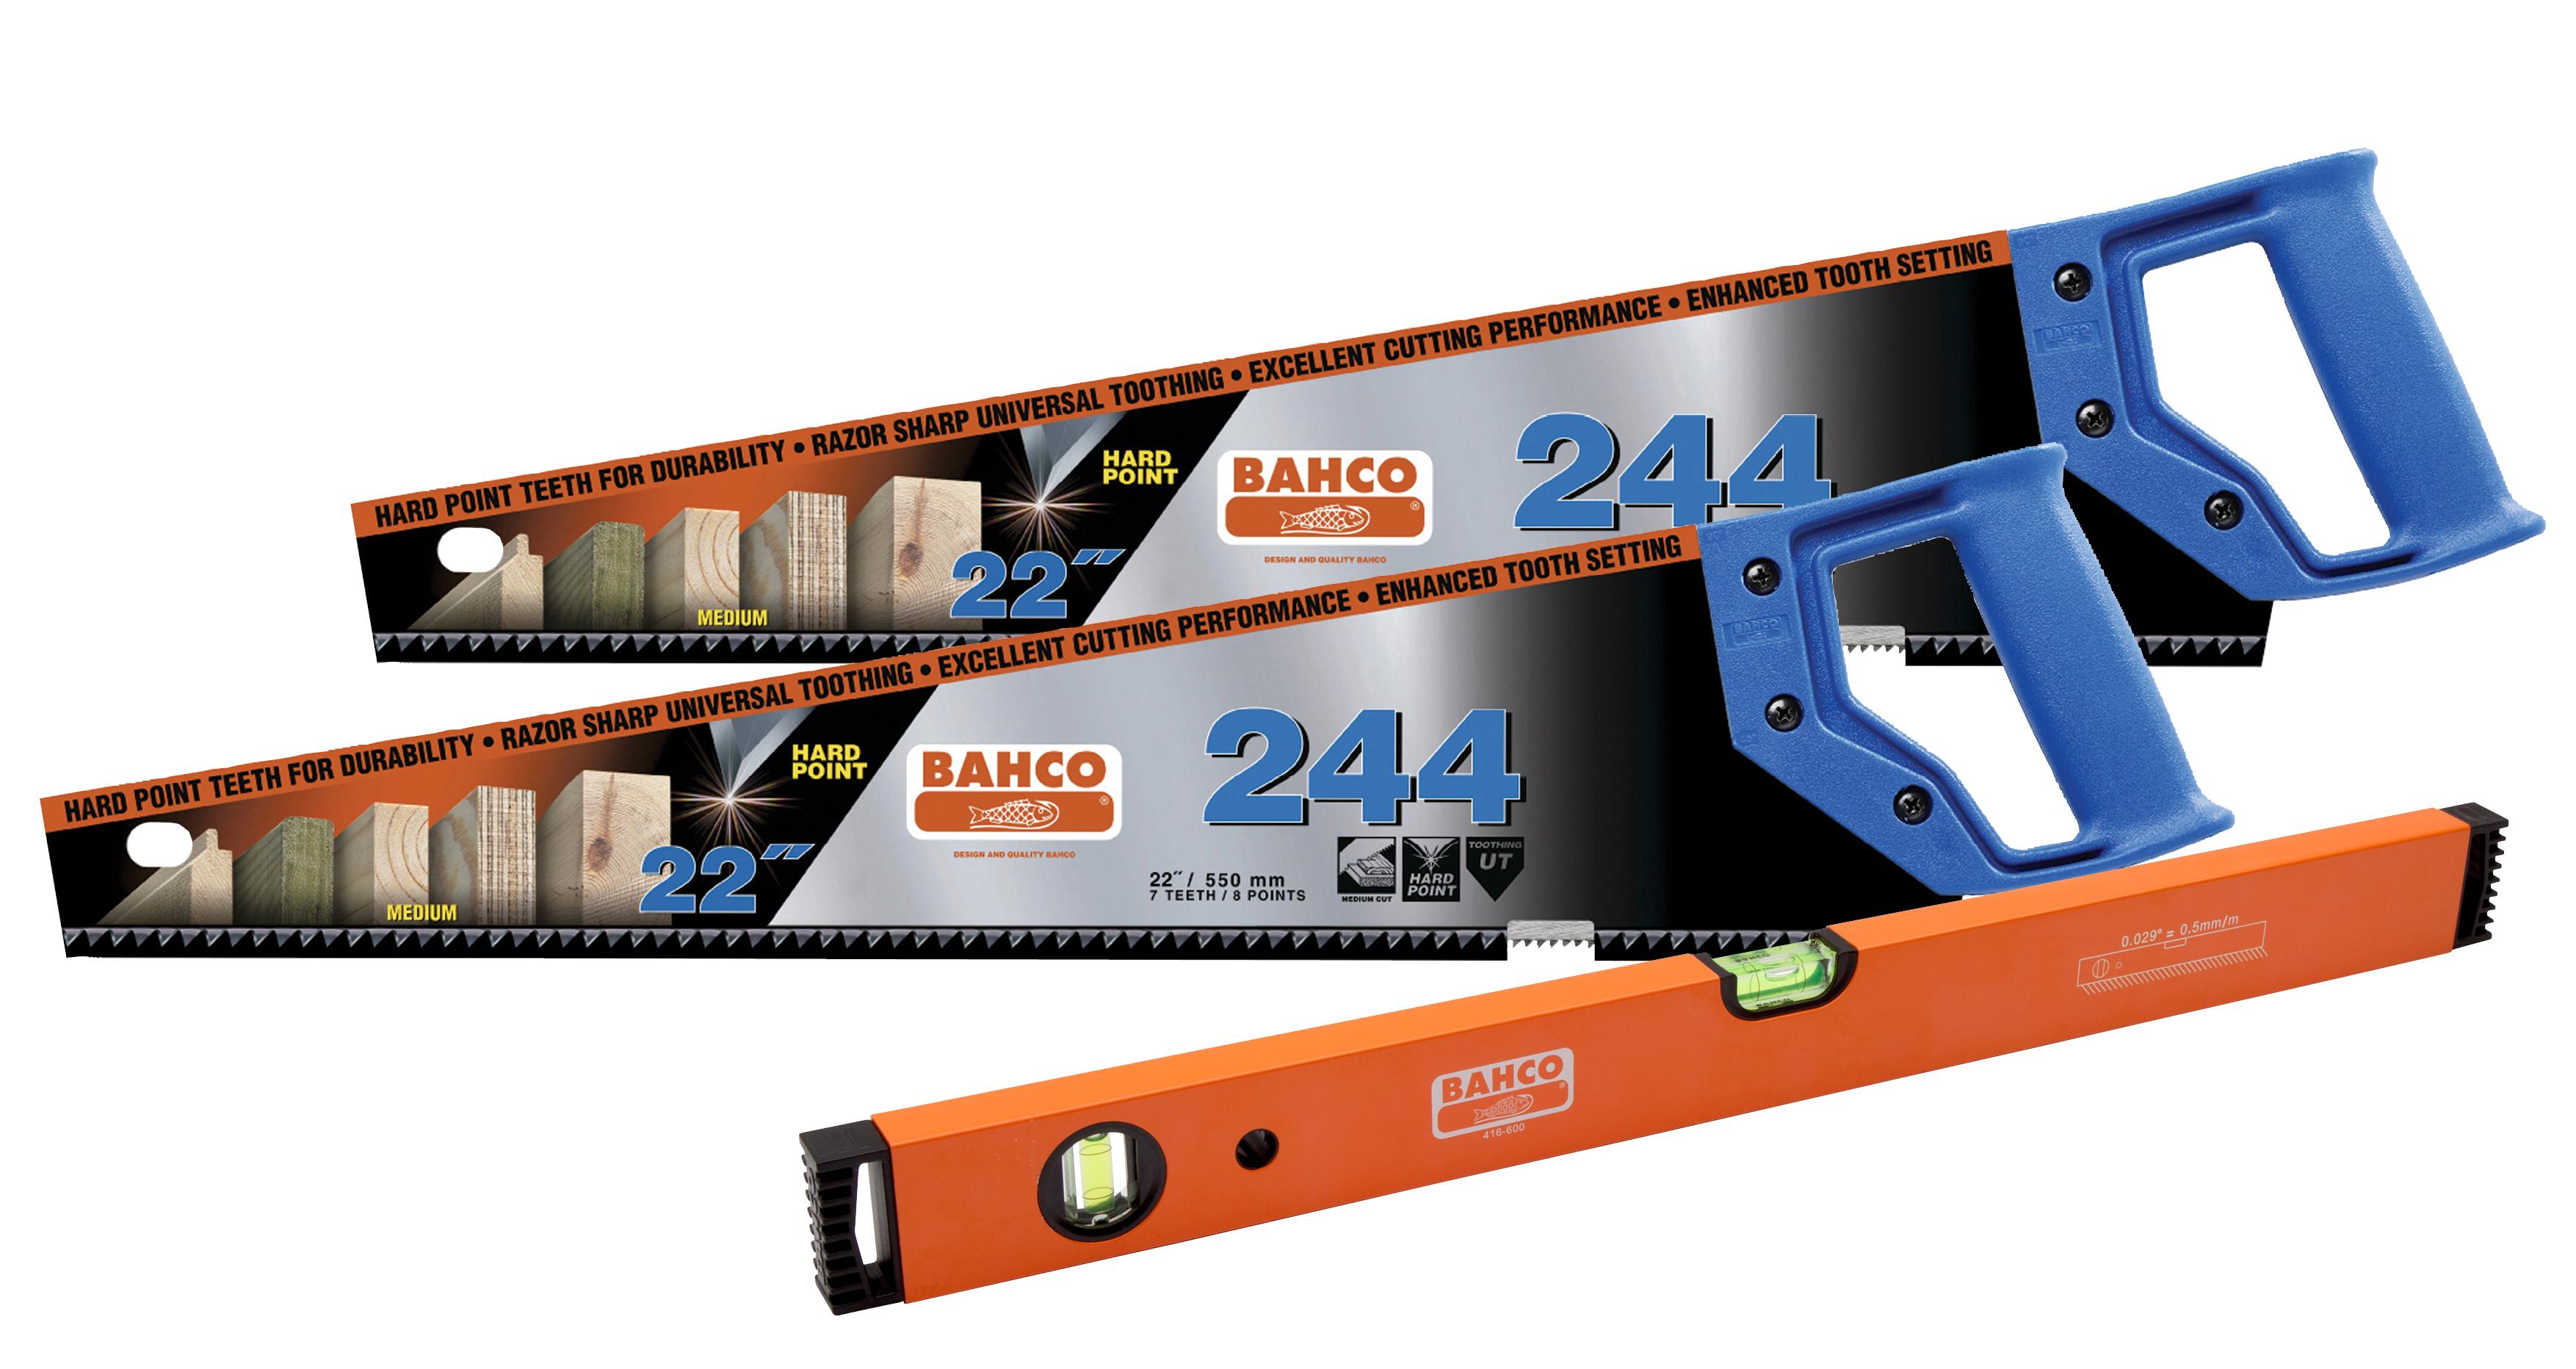 Bahco Saw Set (2 x 244 saws+ 600mm Bahco Level)